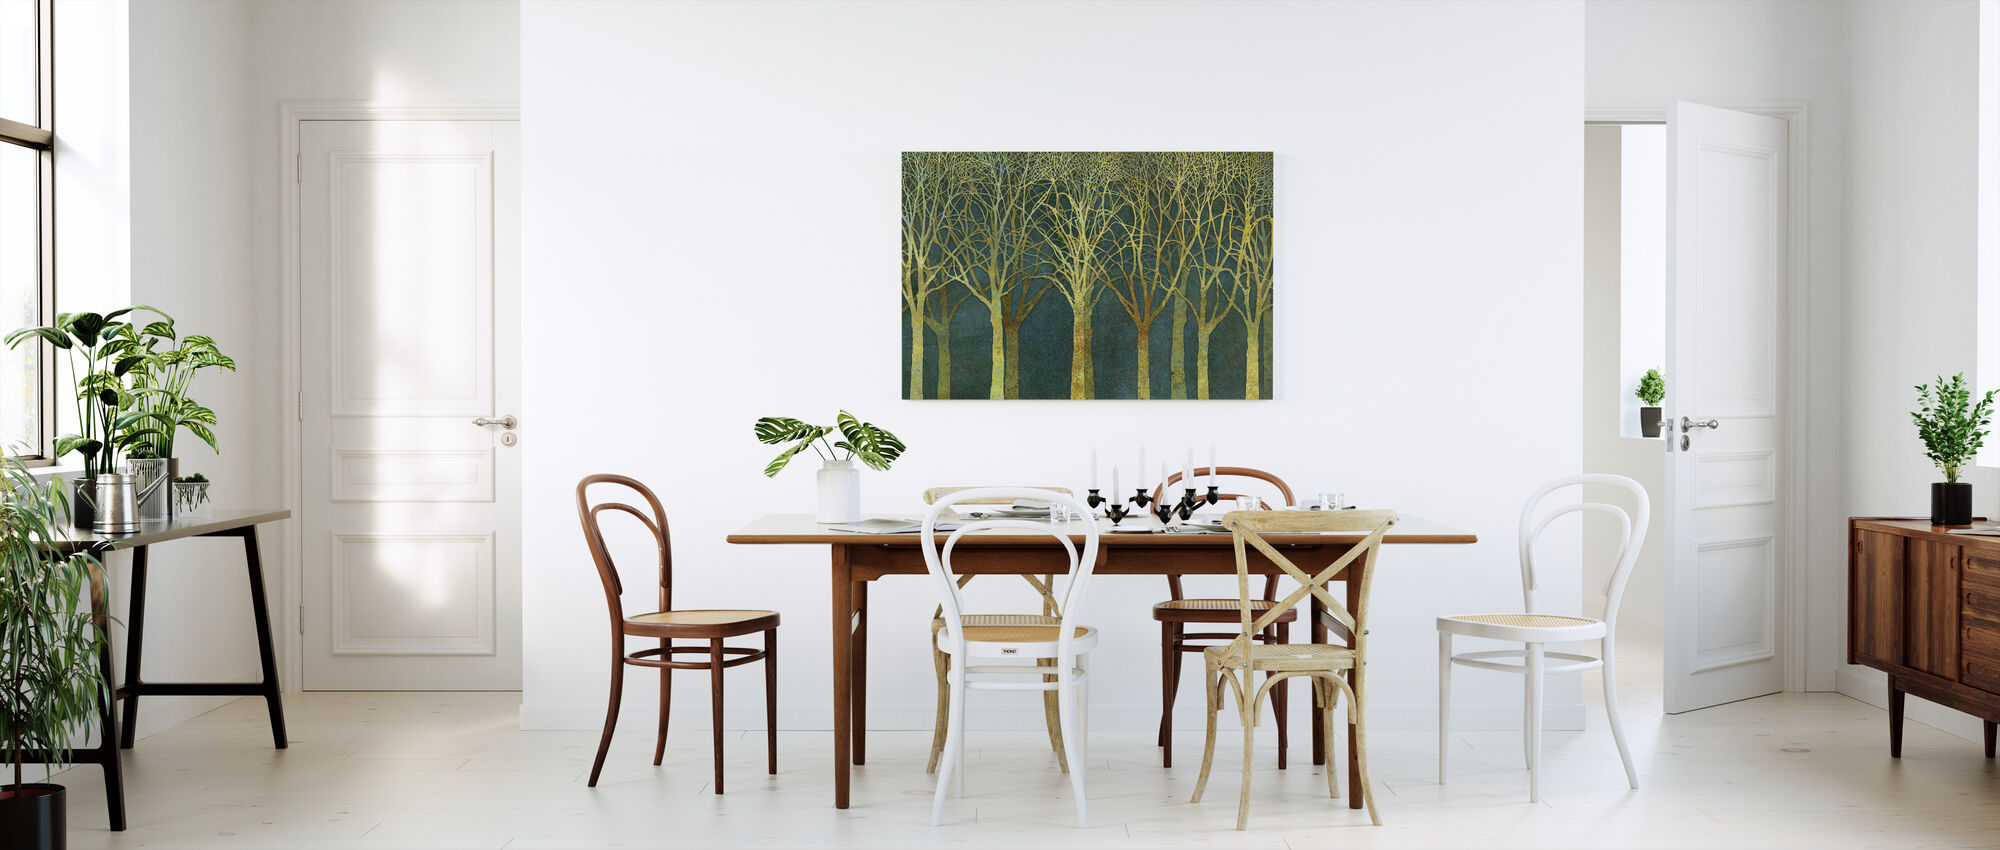 Birch Grove Golden Light - Canvas print - Kitchen